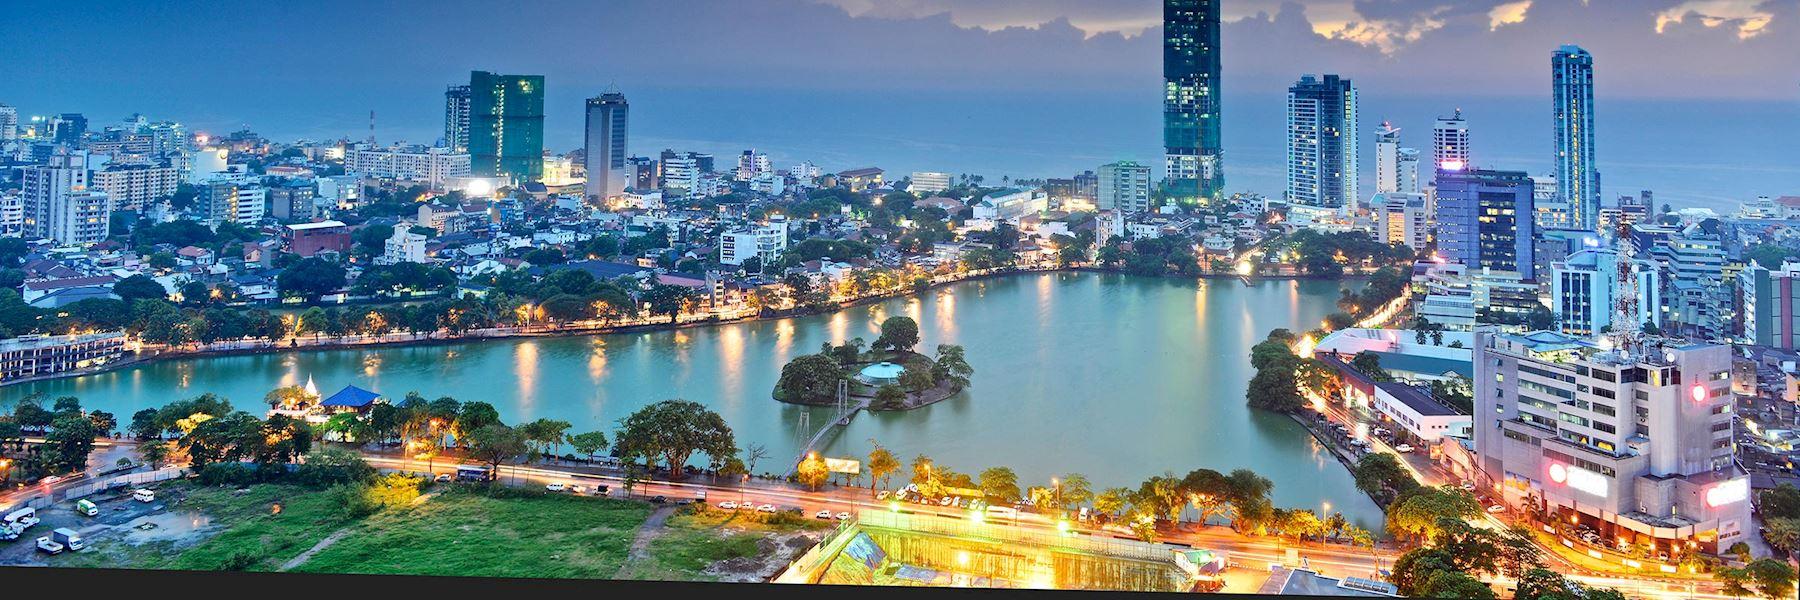 Visit Colombo On A Trip To Sri Lanka Audley Travel